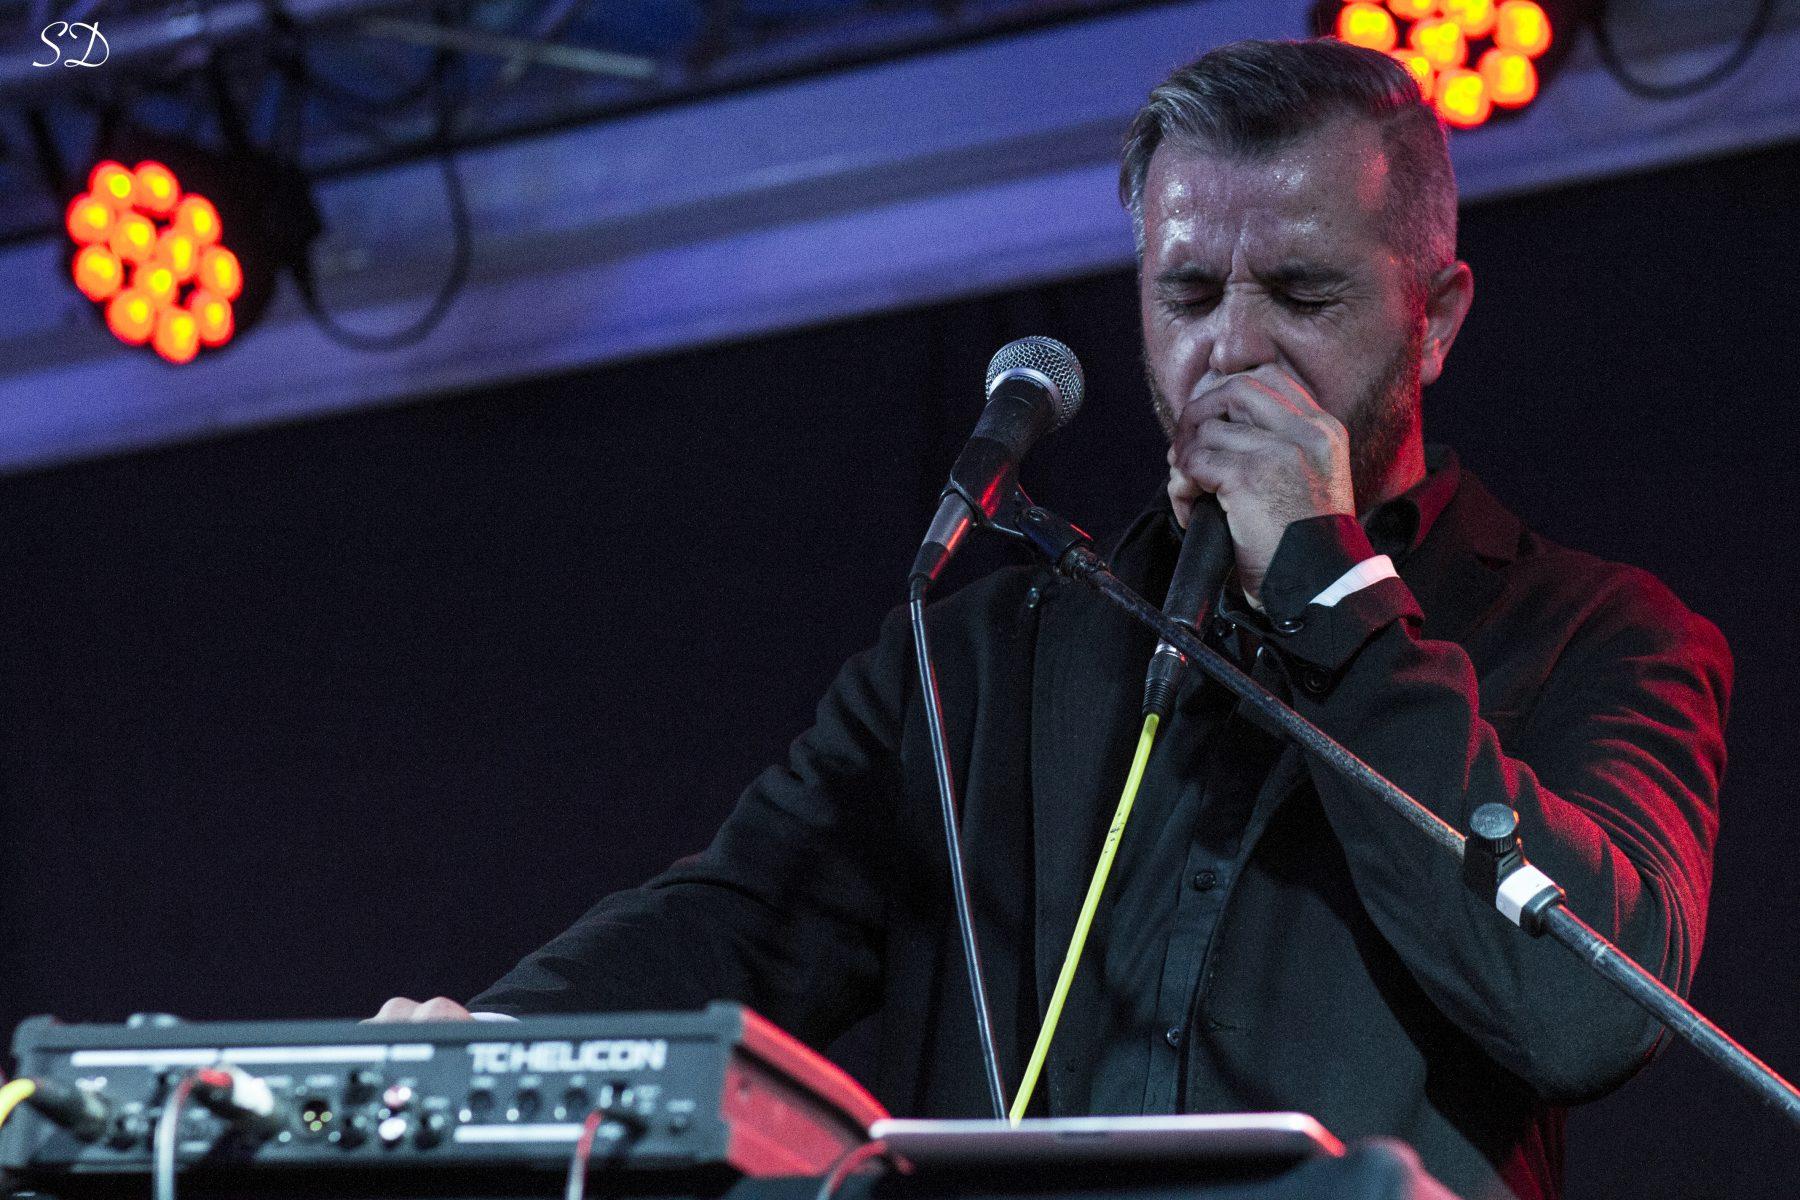 kme - live report - nunc - stefania desotgiu - sa scena sarda - 2019 - karel music expo